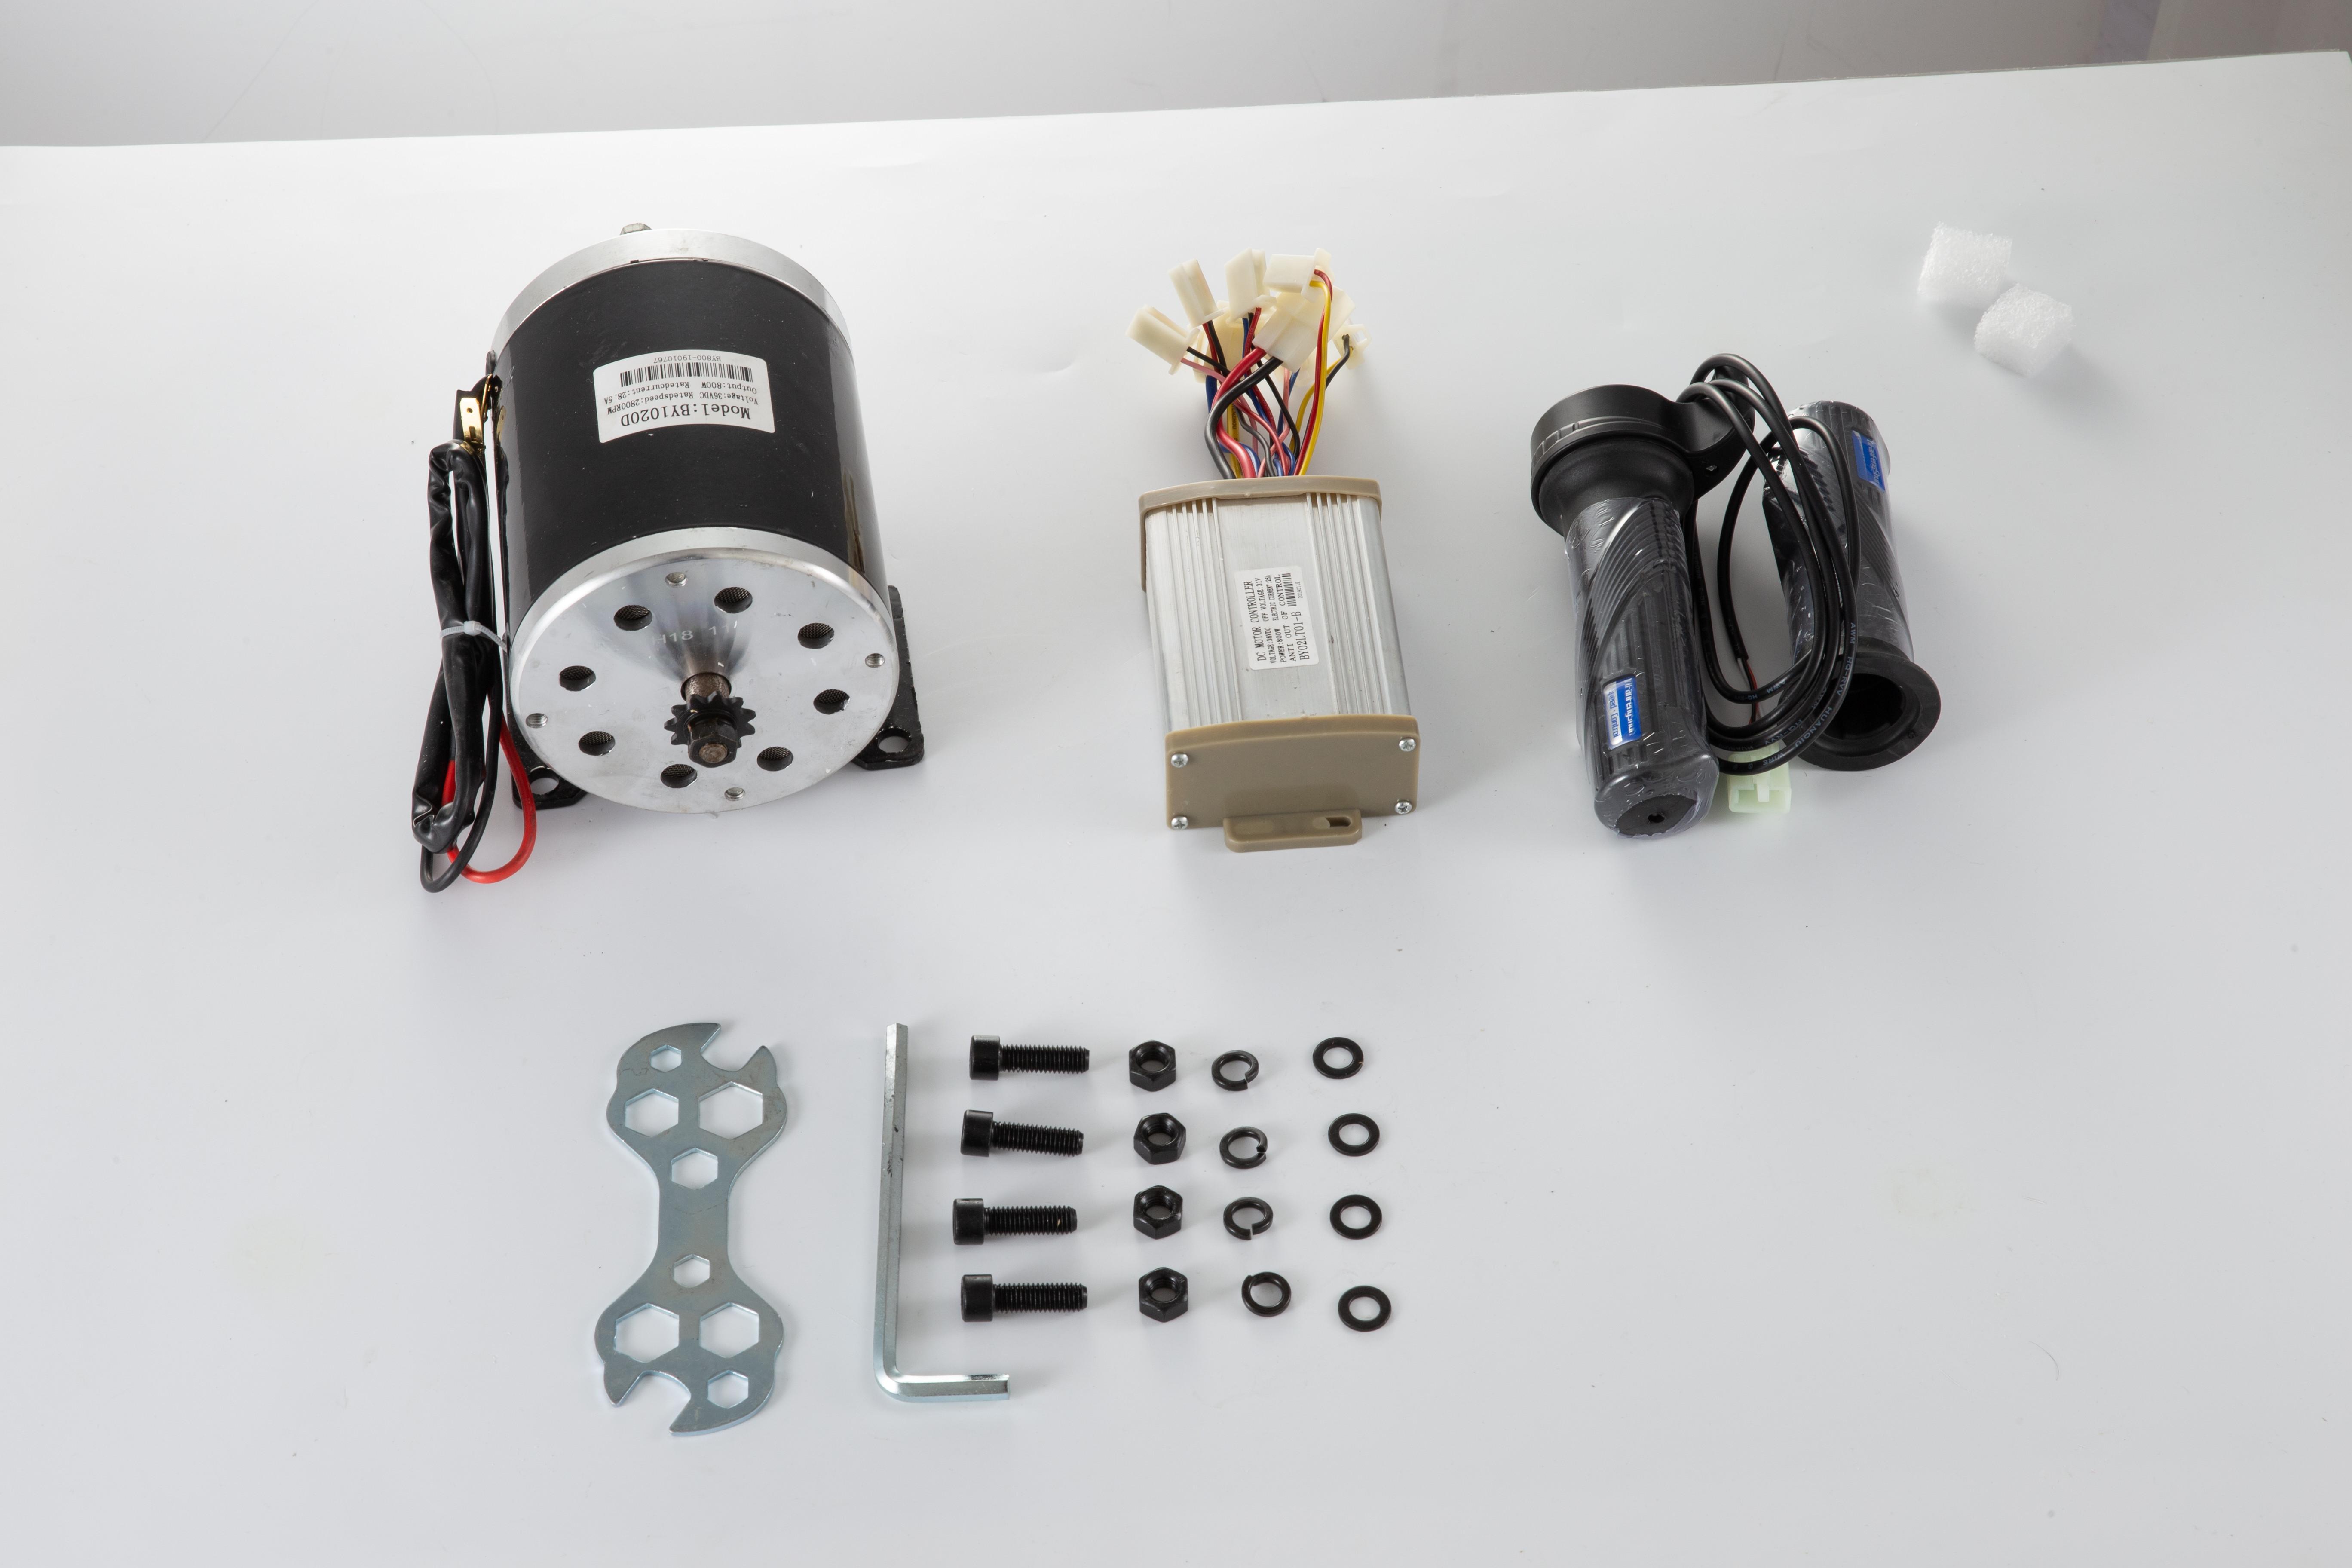 36v-Electric-Motor-controller-throttle-kit-f-Scooter-E-Scooter-ATV-Permanent thumbnail 120